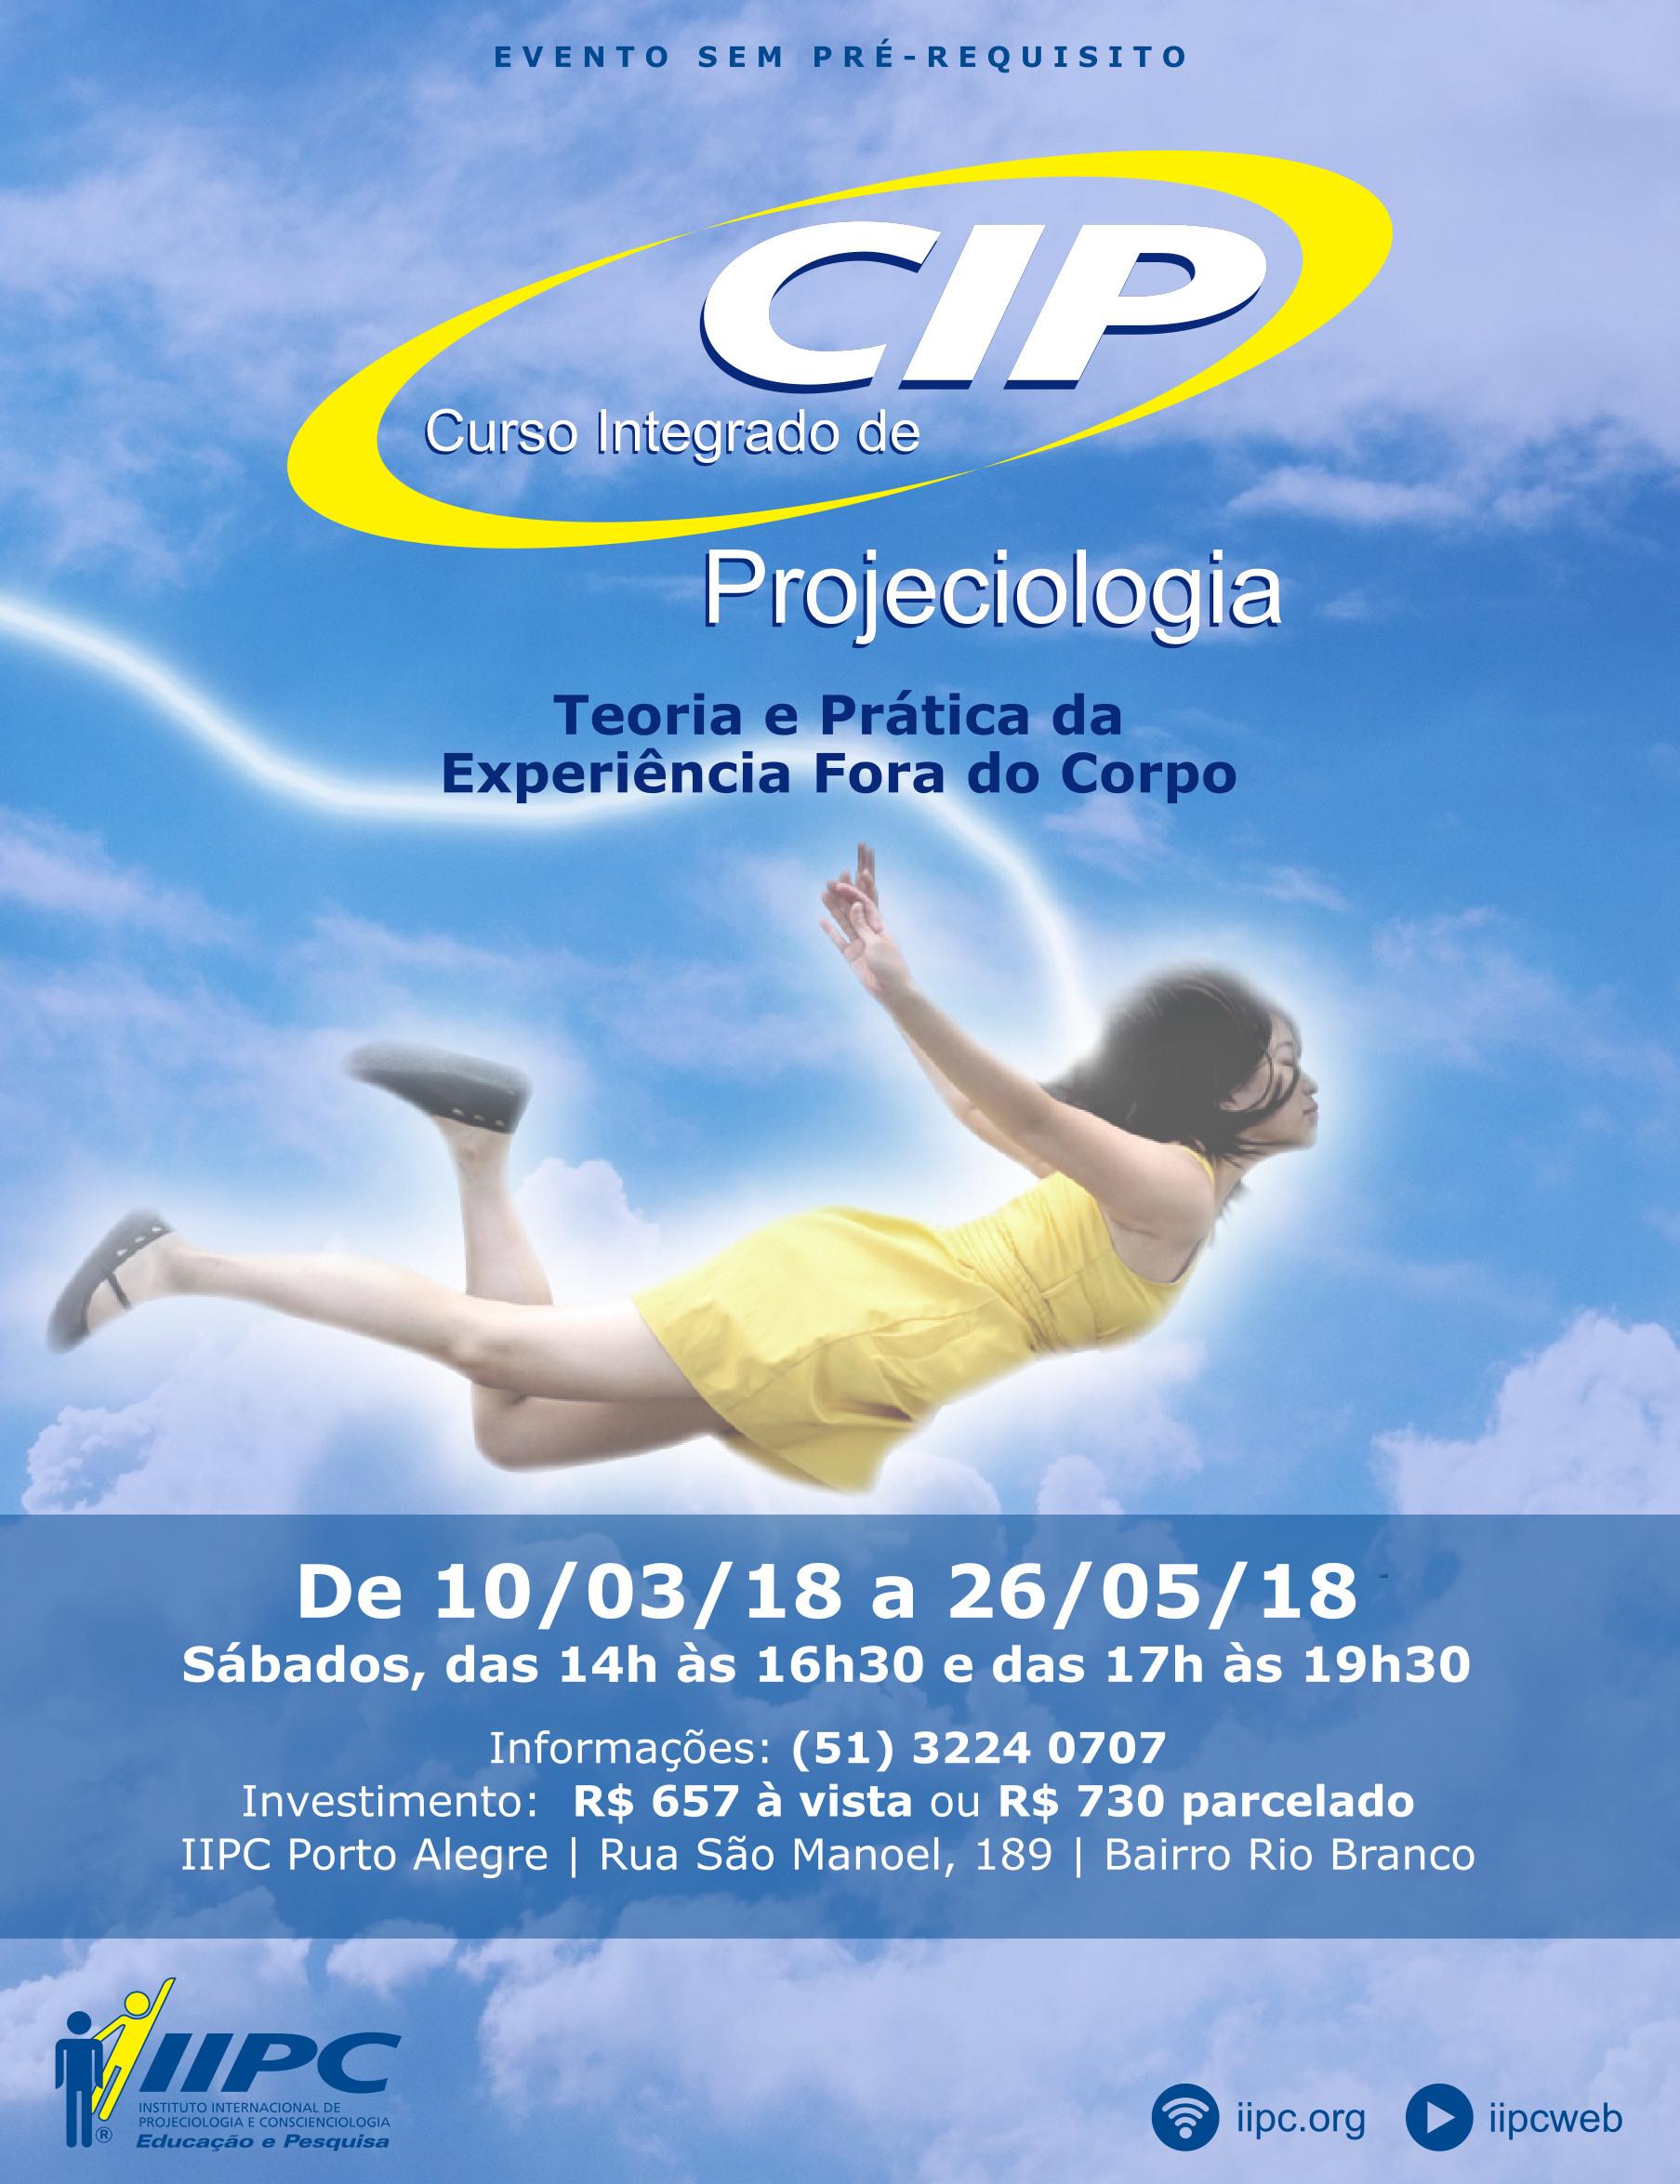 696573 cip porto alegre 10 03 2018 volitando (1)